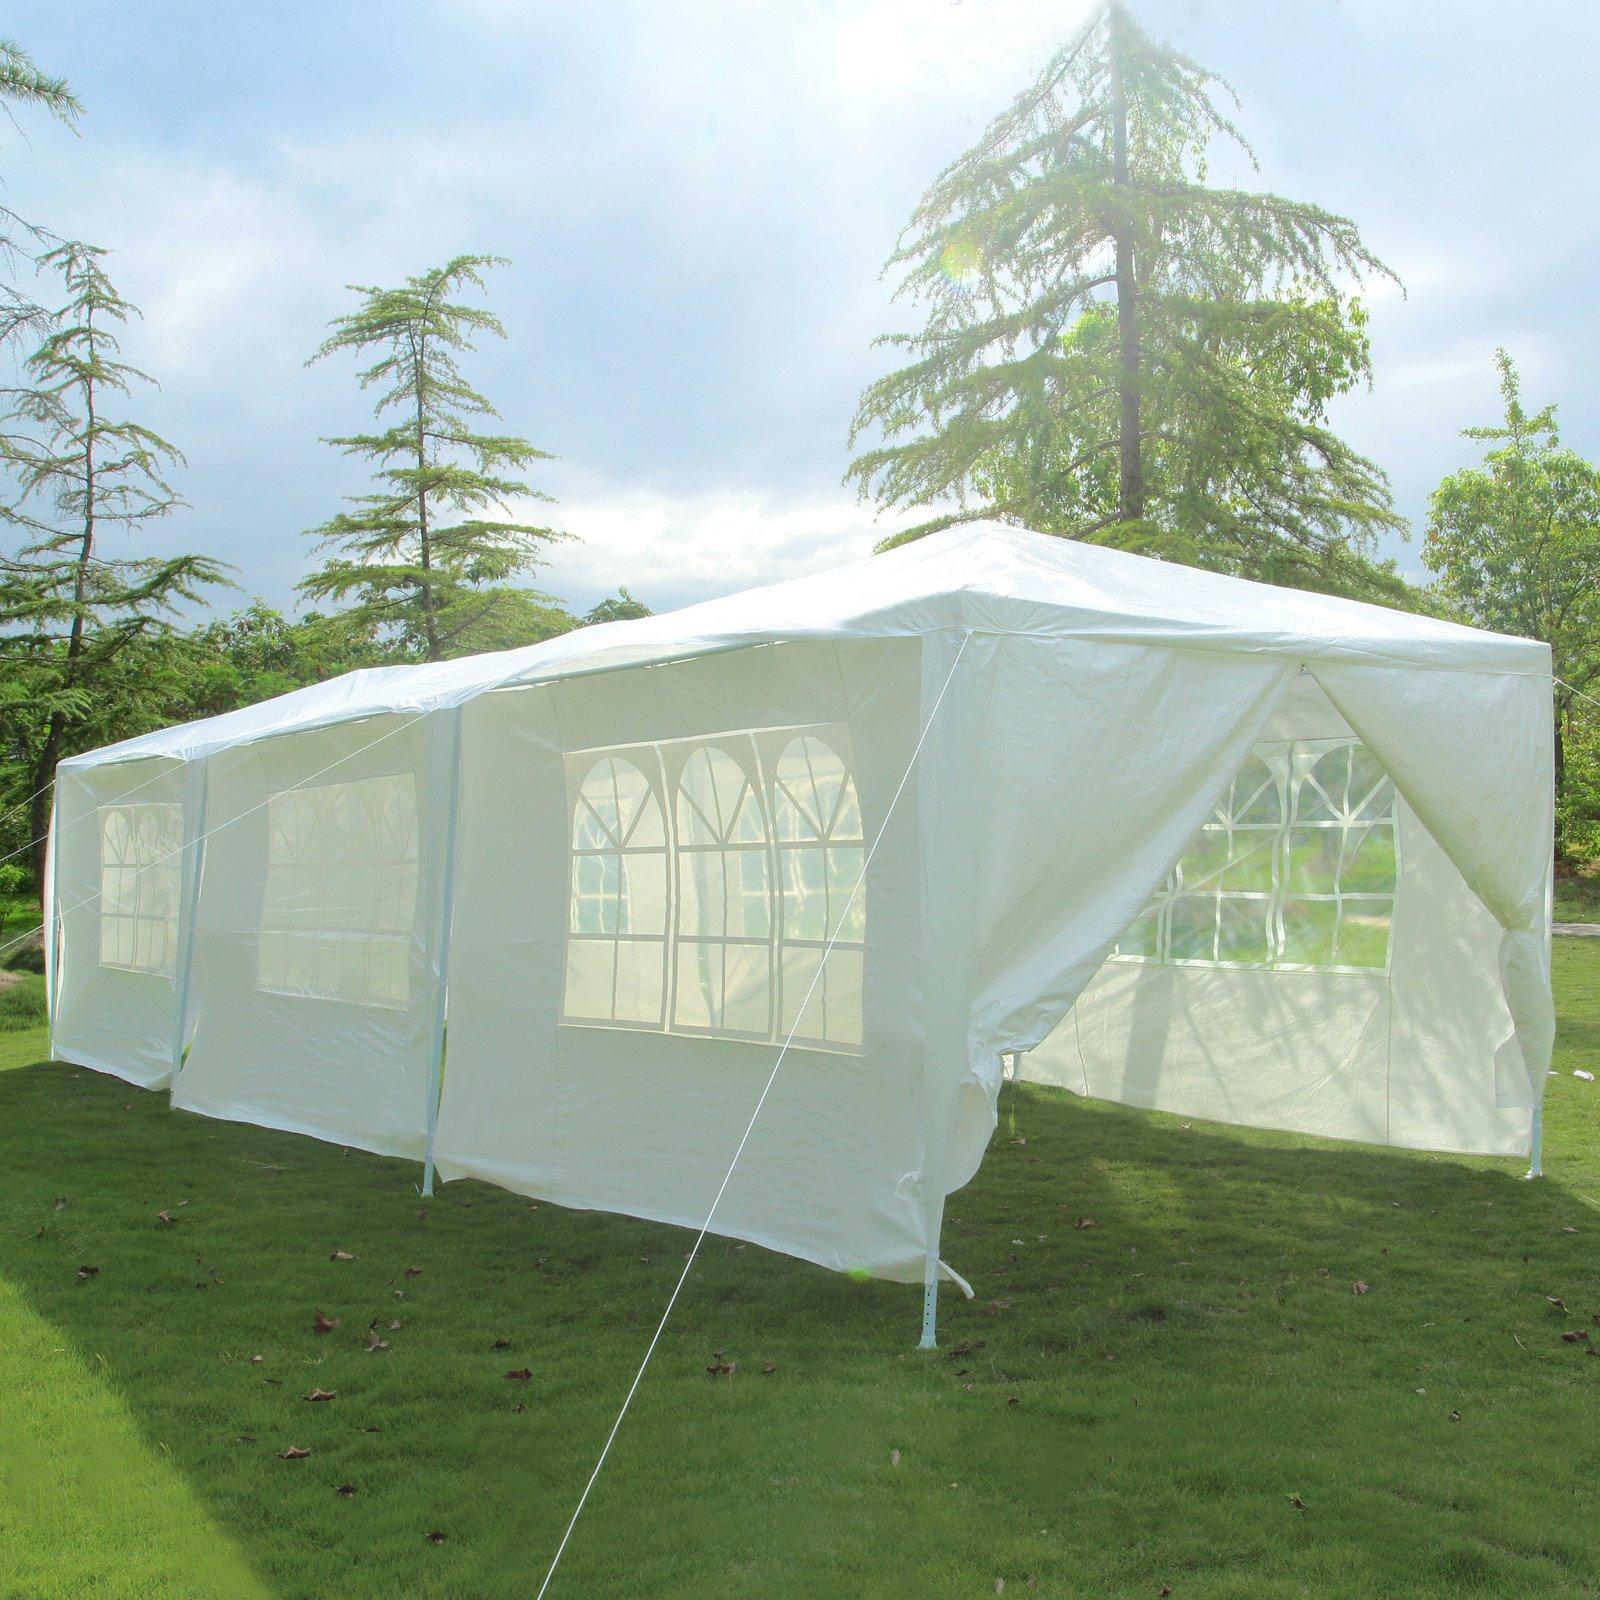 ORKAN 10'x30' Canopy Party Wedding Tent Outdoor Gazebo Heavy Duty 8 Sidewalls